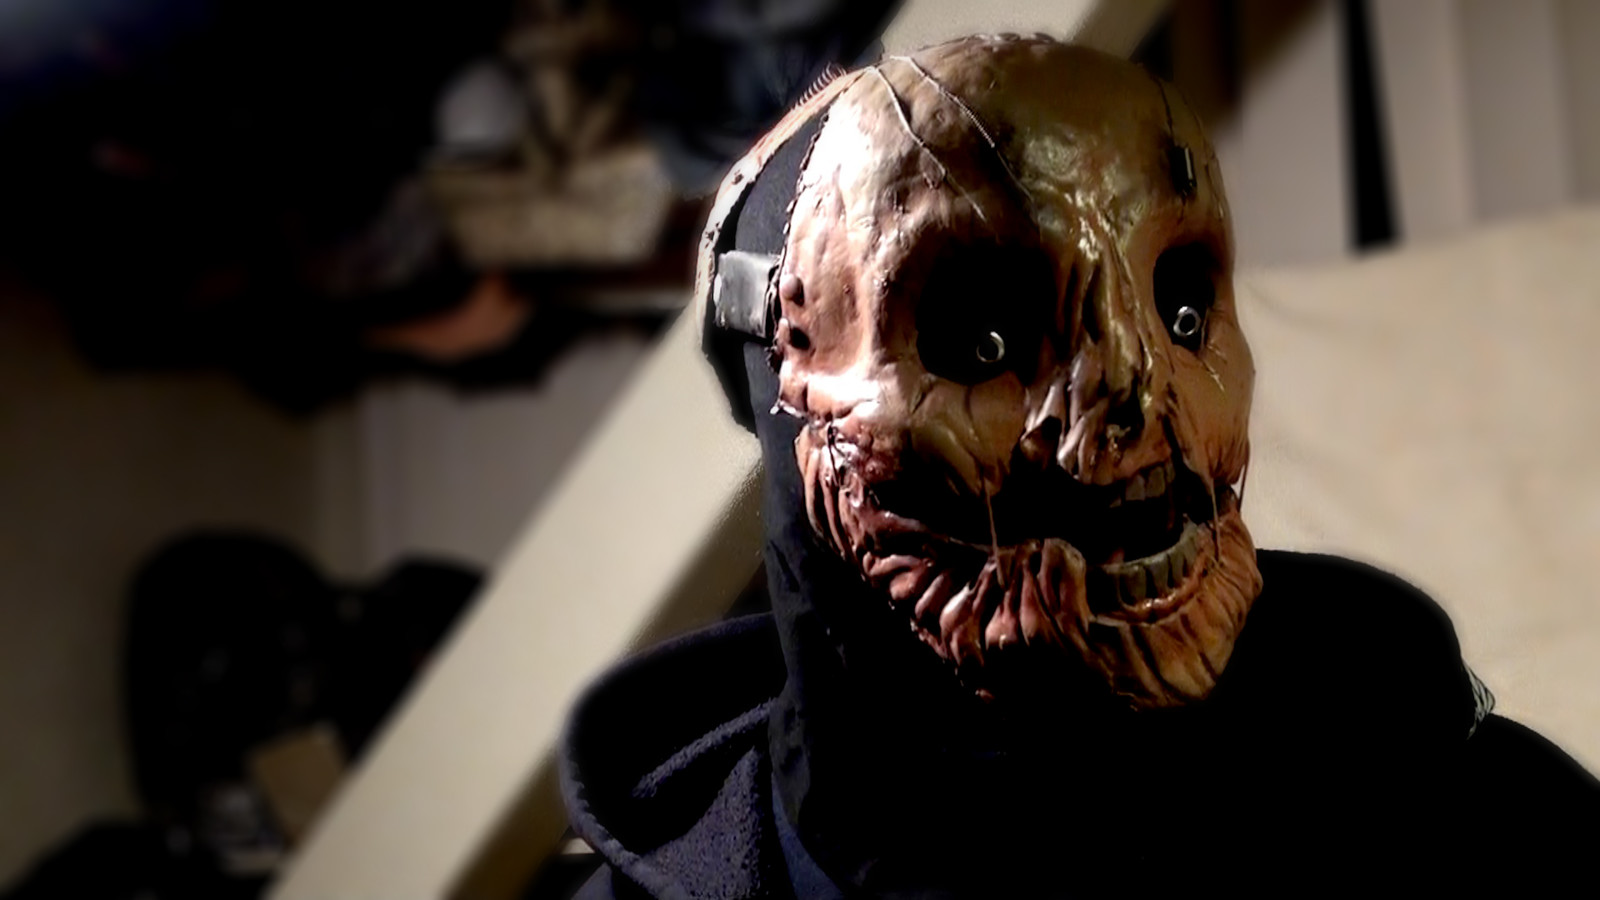 Sentinel (2013) - Alternate of the original Stigmata mask